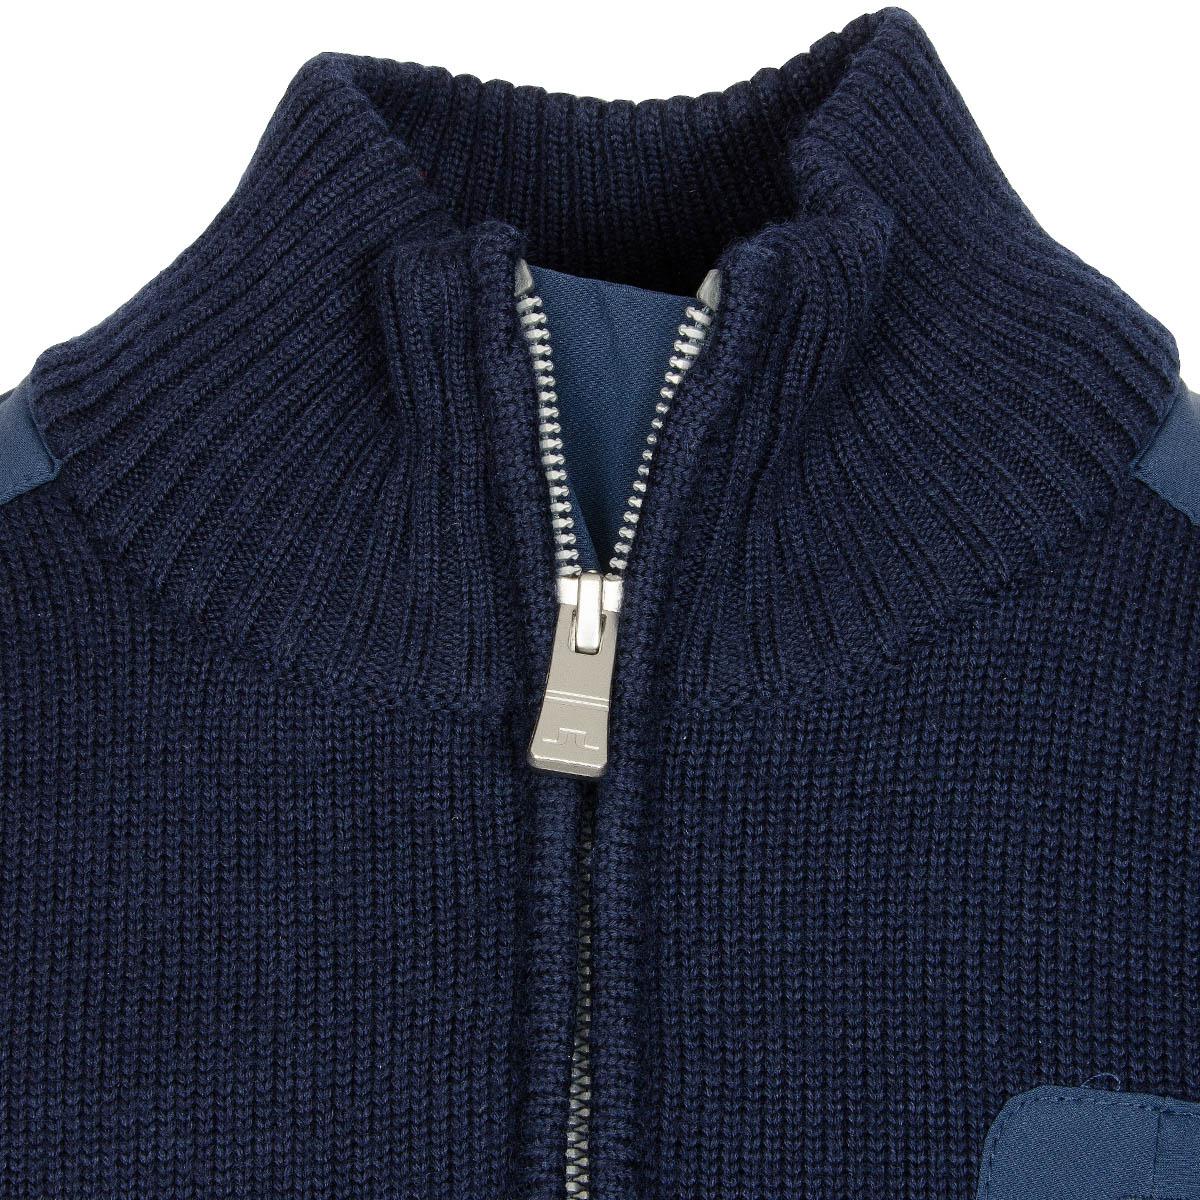 Knitting Patterns For Golf Jumpers : J Lindeberg Windstopper Knitted Sweater Navy/Purple Scottsdale Golf